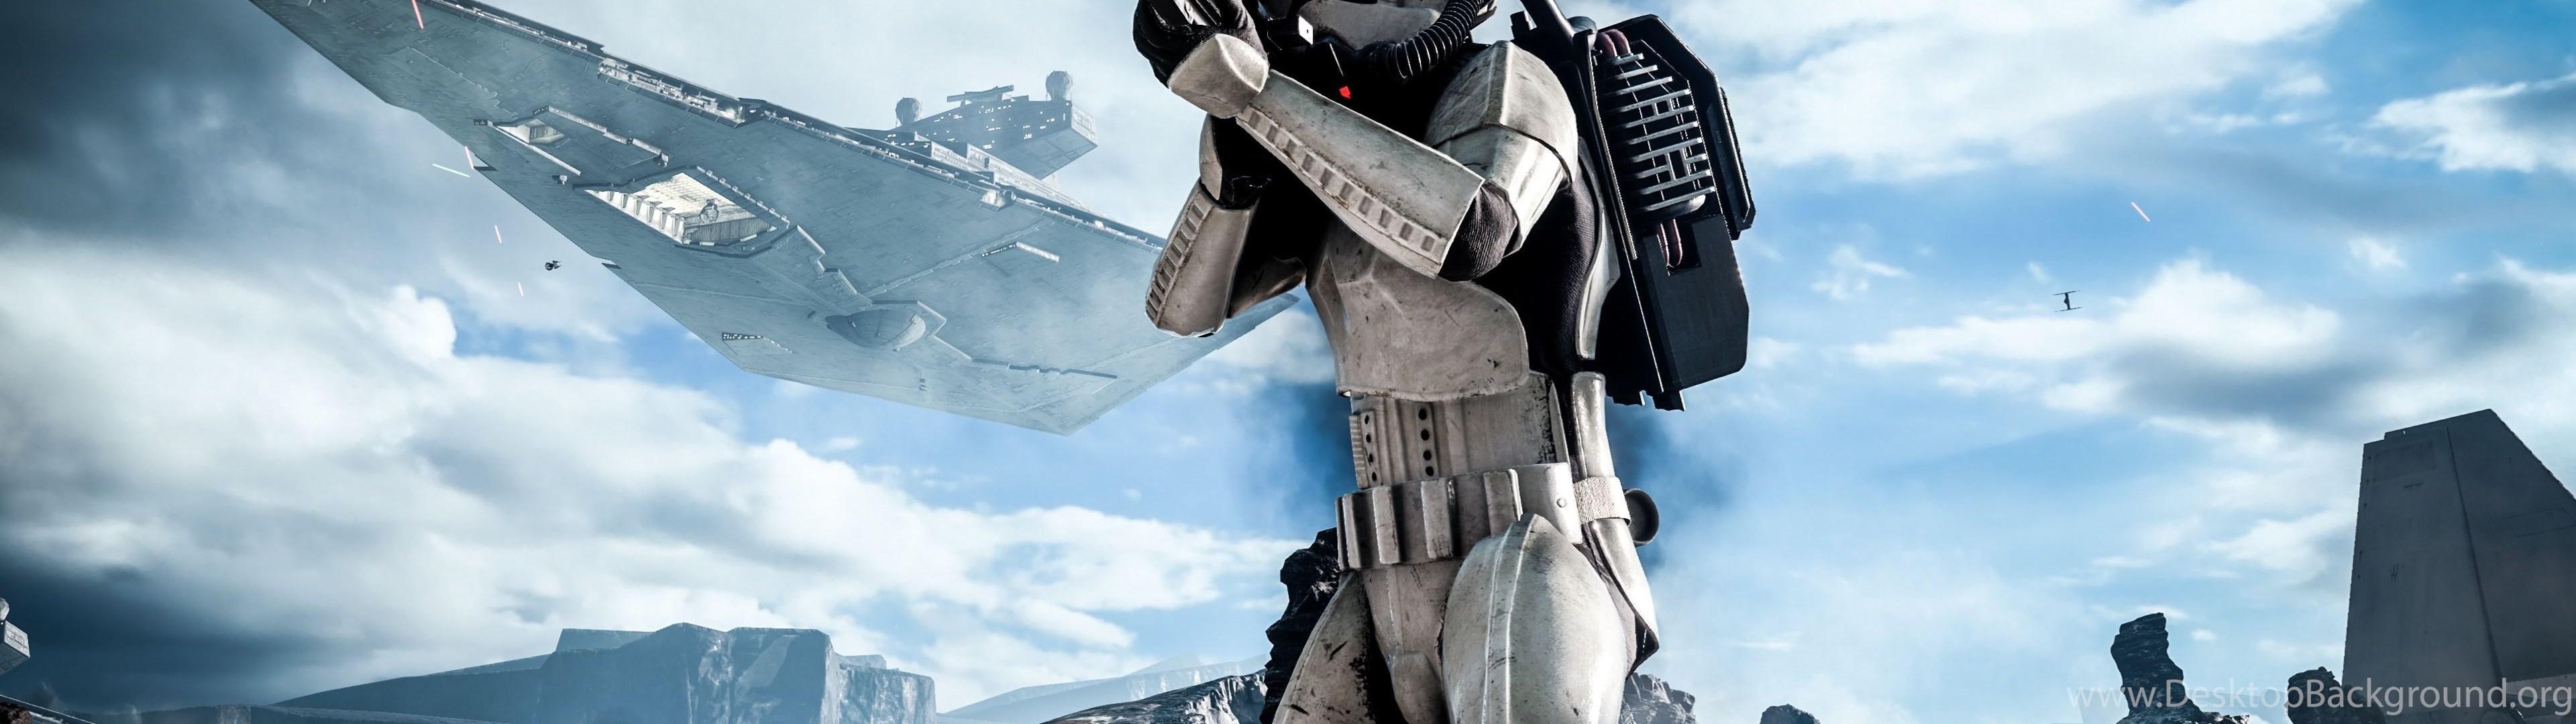 Star Wars Battlefront Stormtrooper Wallpapers Desktop Backgrounds